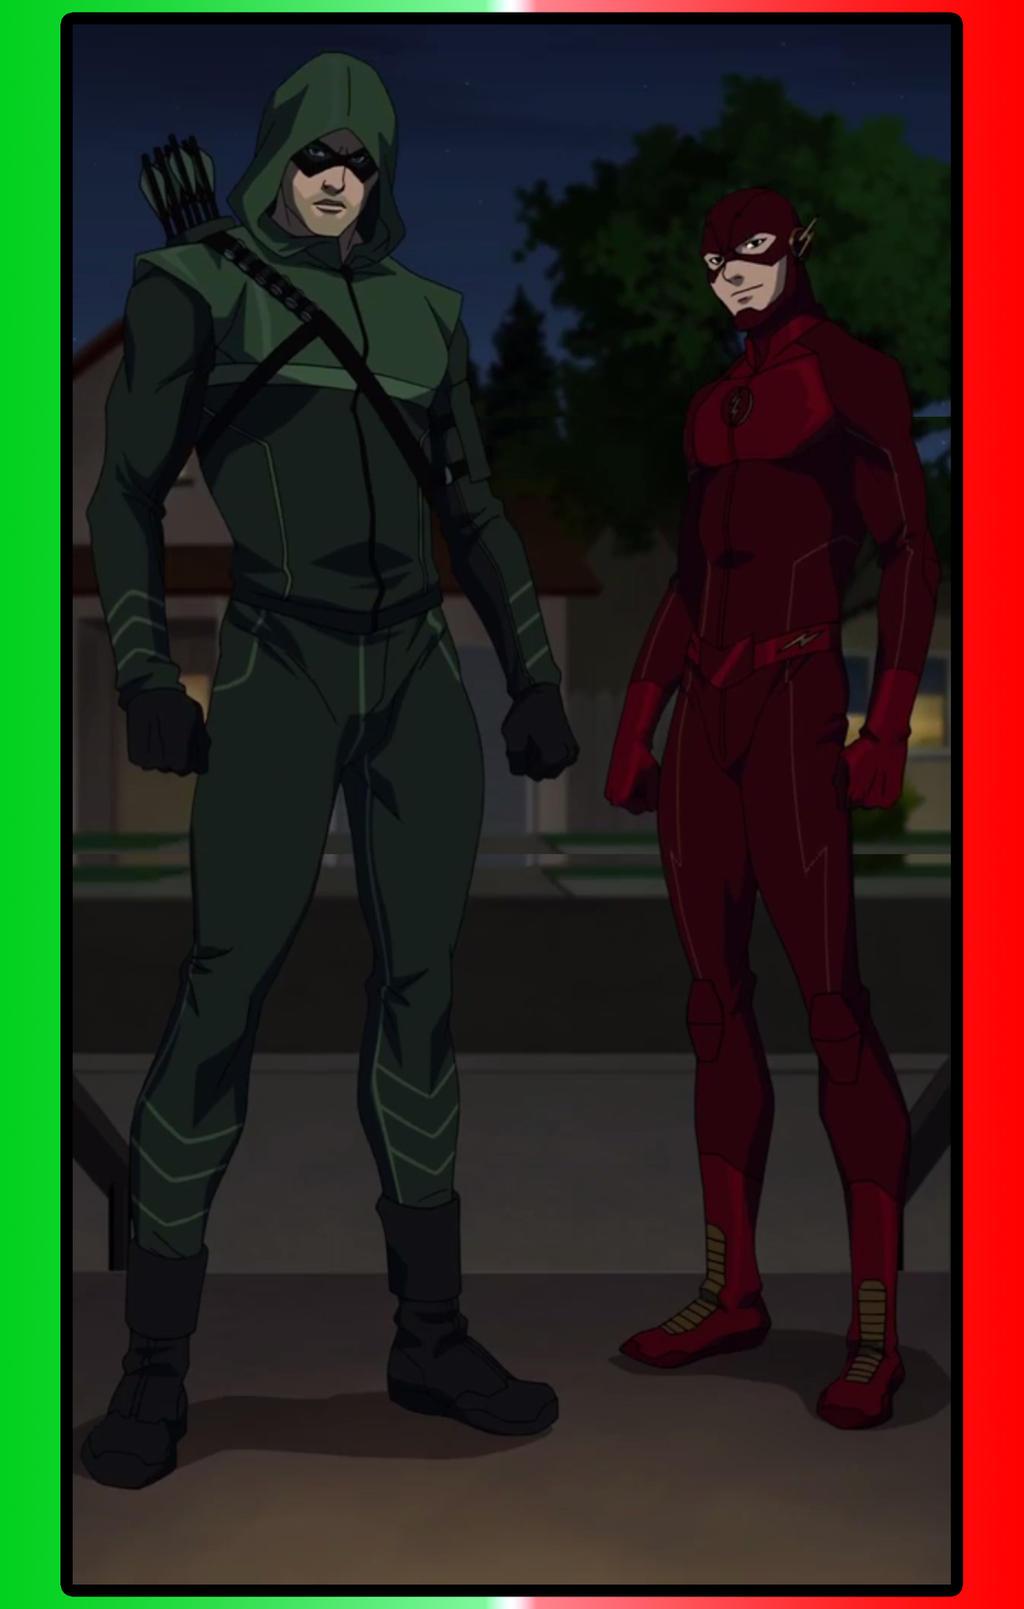 Arrow+Flash animated by MOMOpJonny on DeviantArt